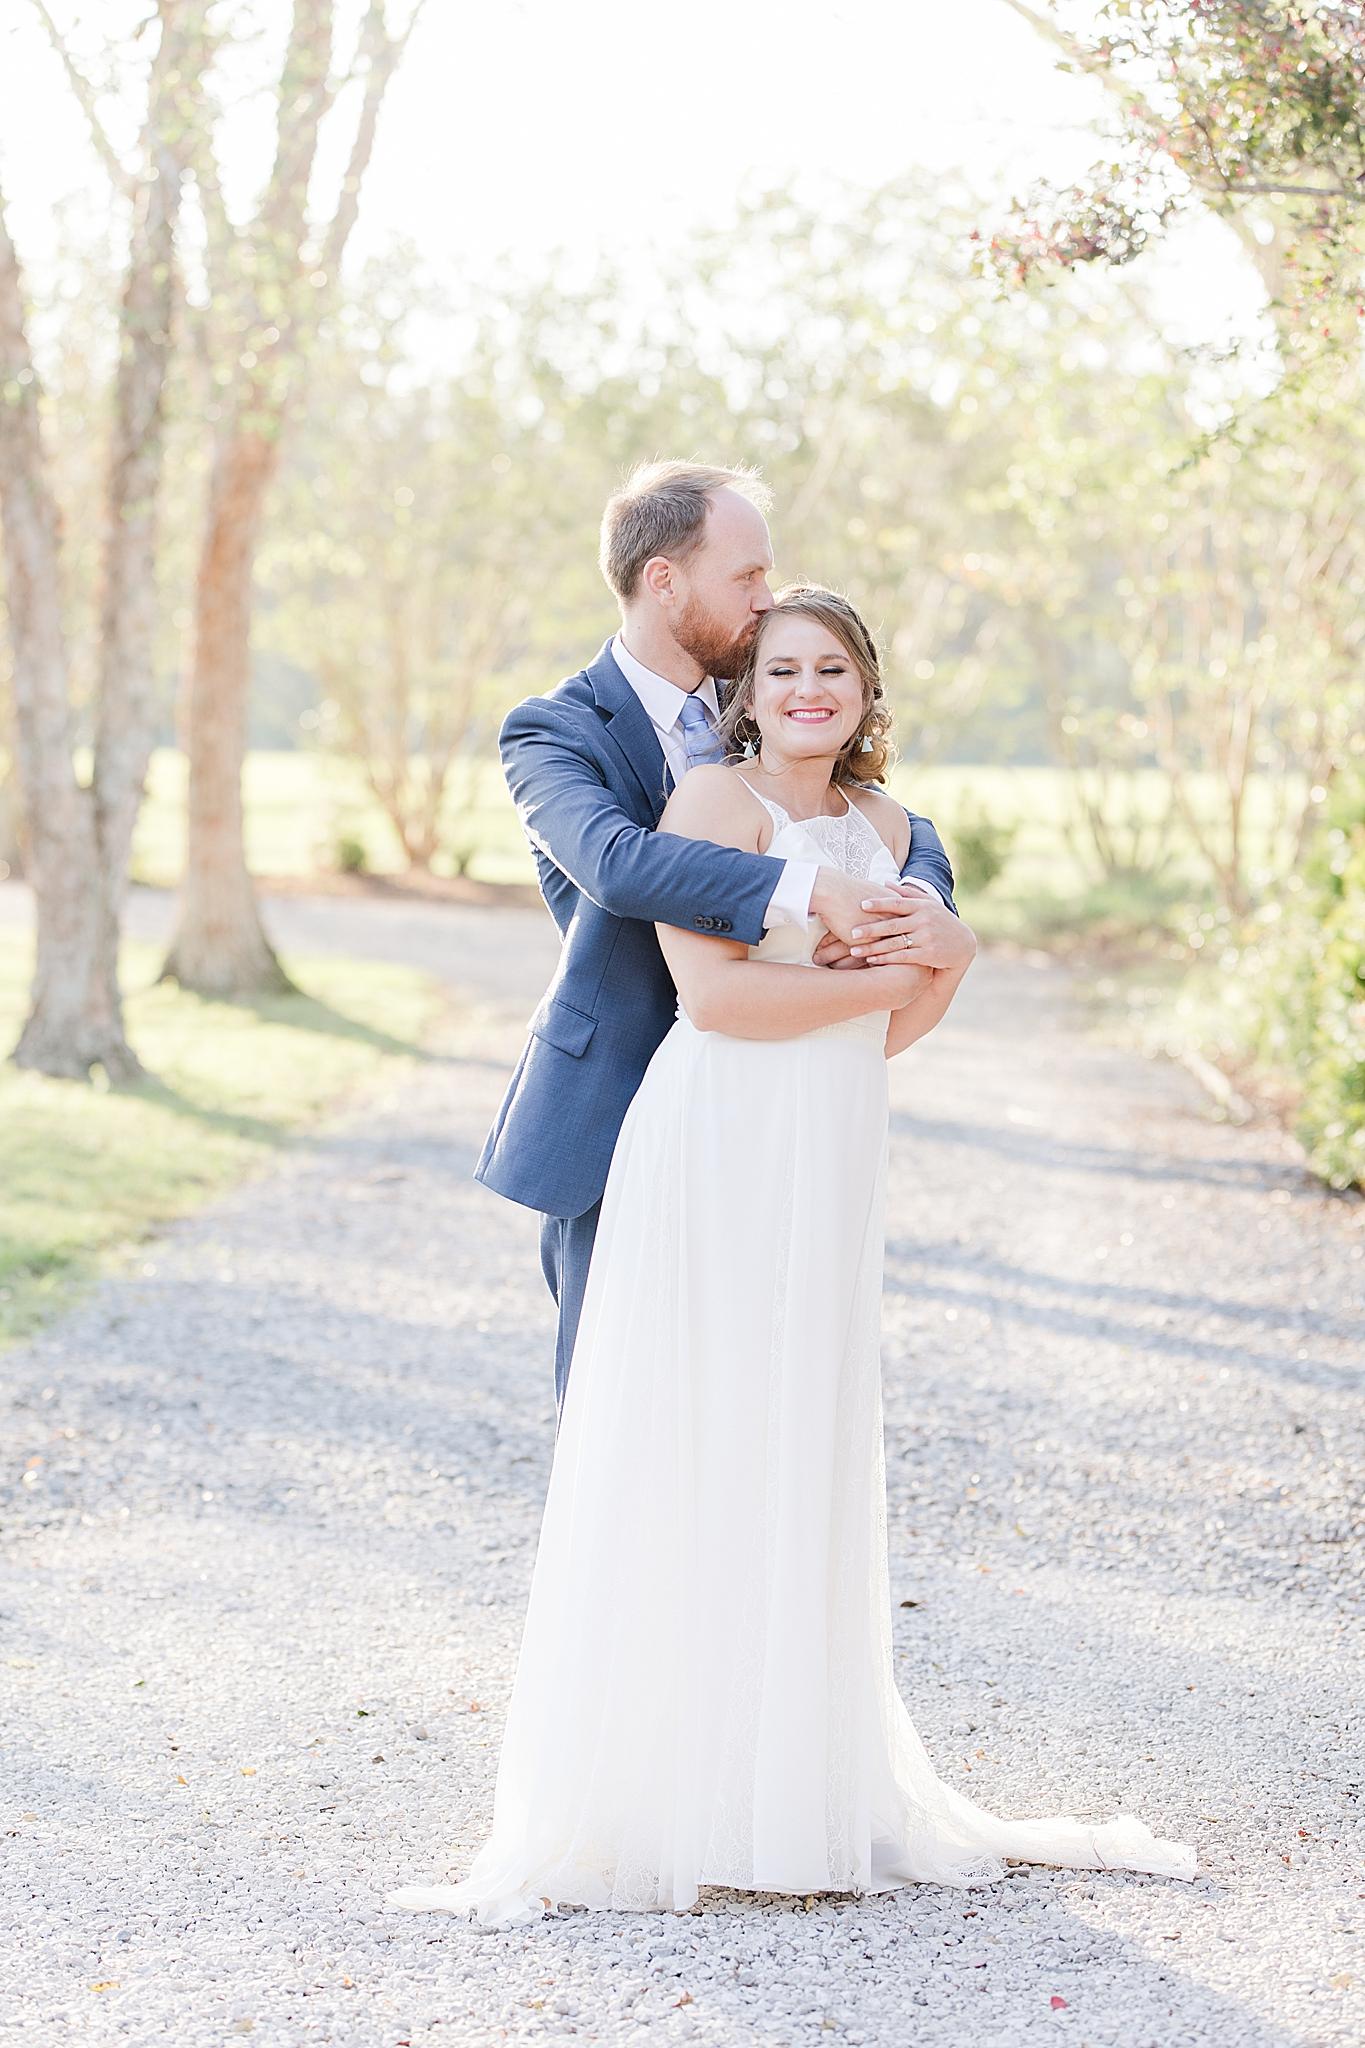 groom kisses bride on head during wedding photos at Burkhardt Pond